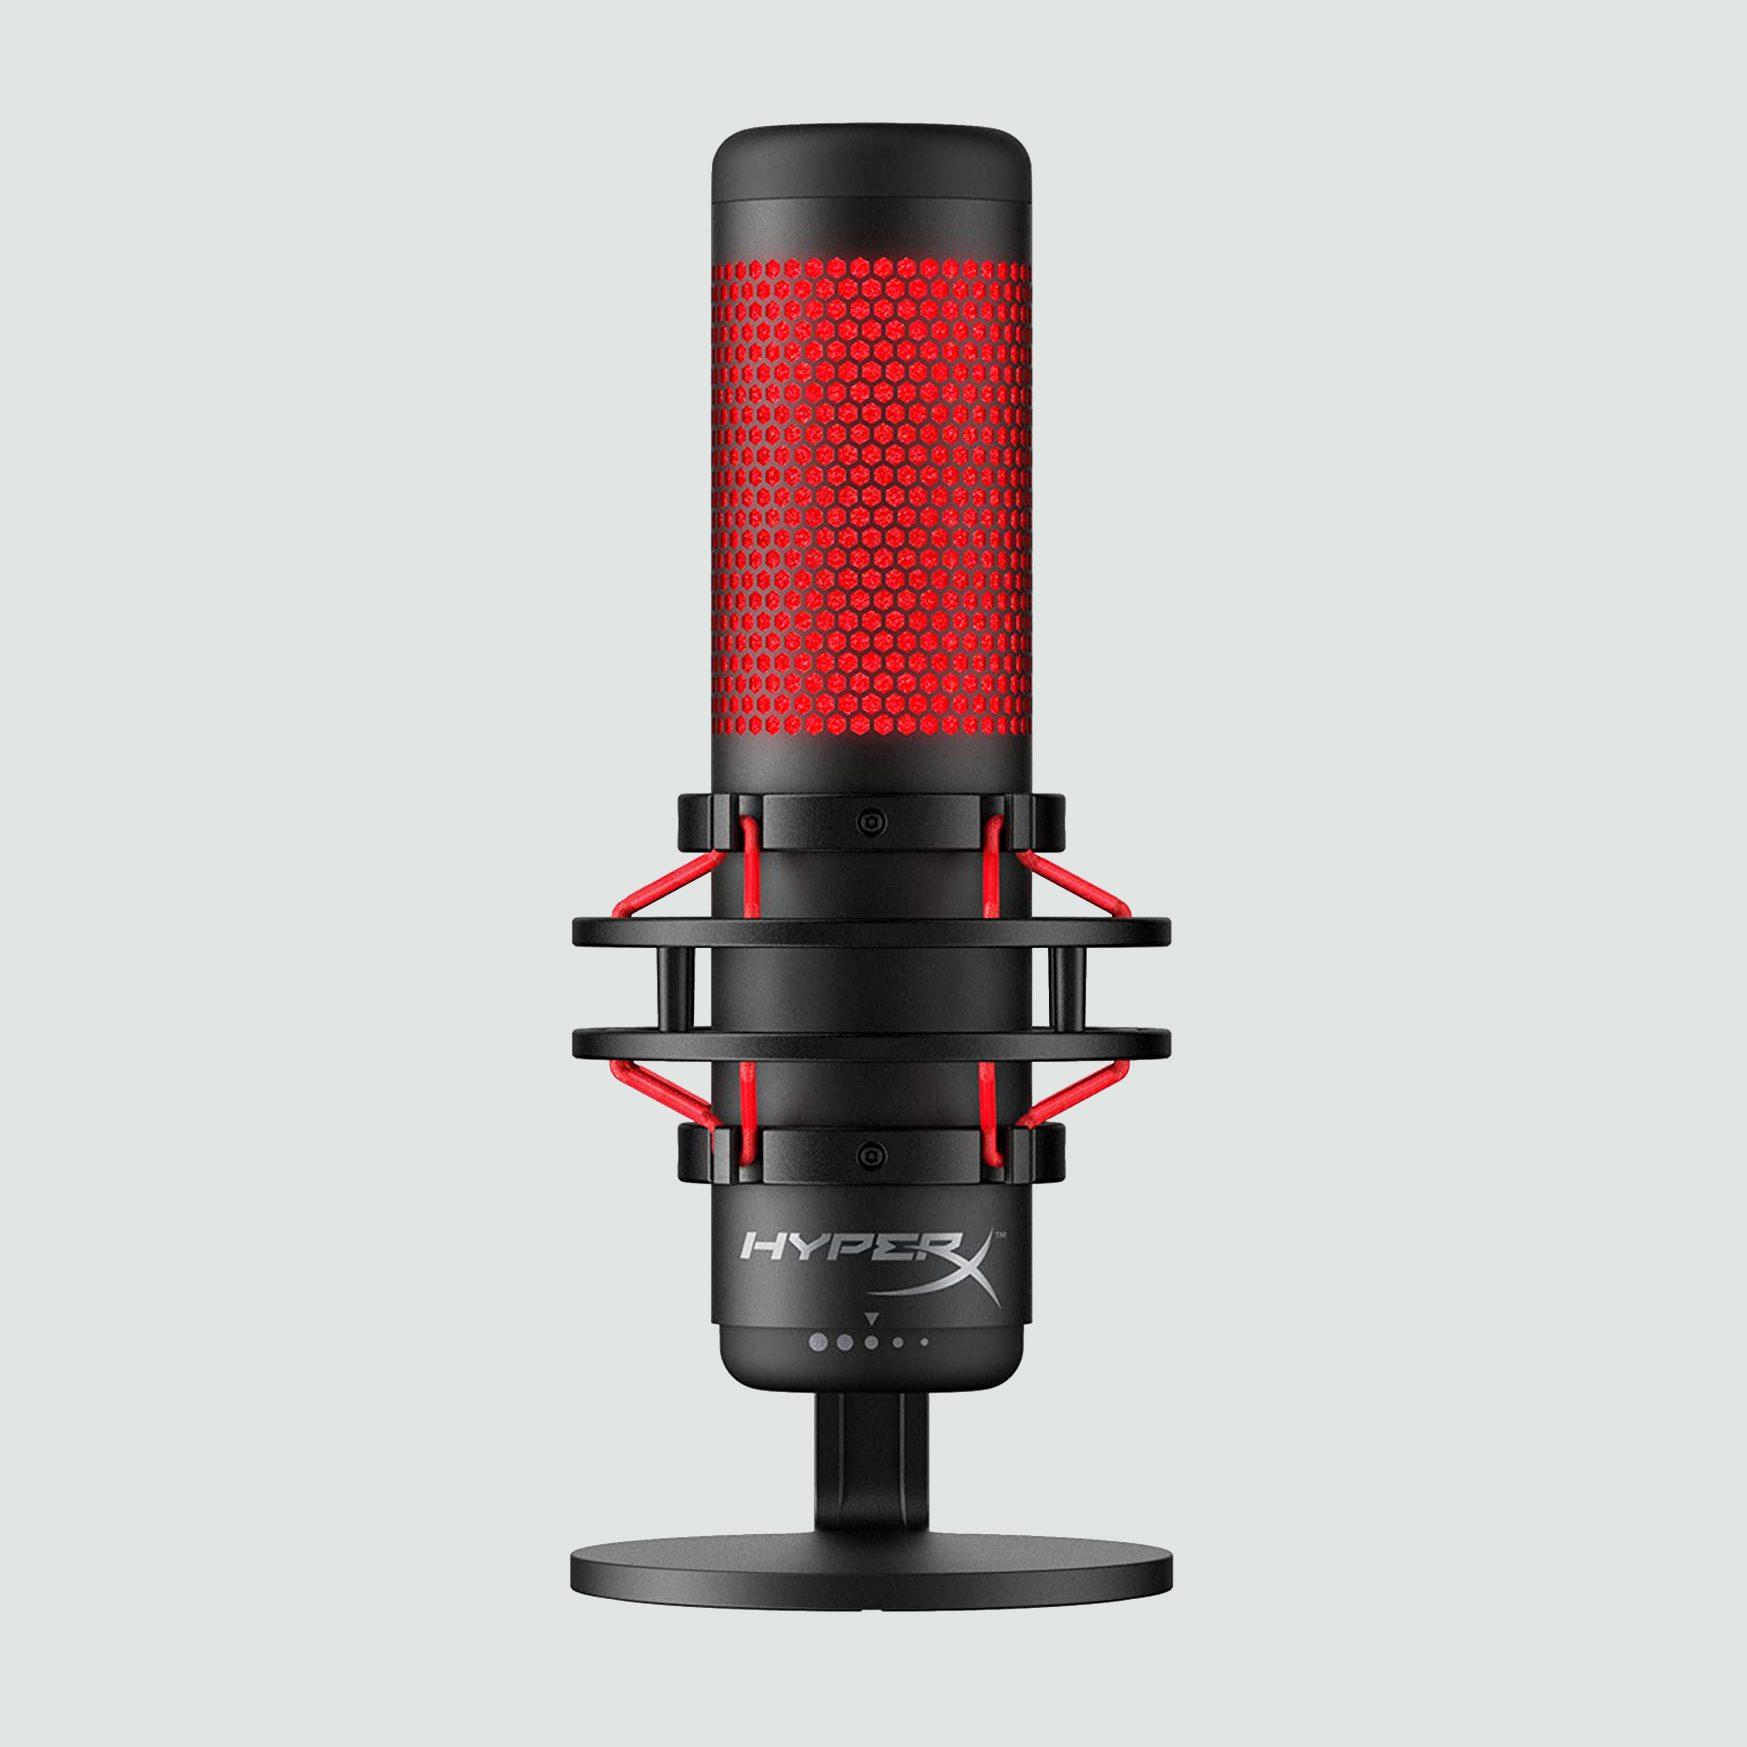 HyperX QuadCast USB Condenser Microphone